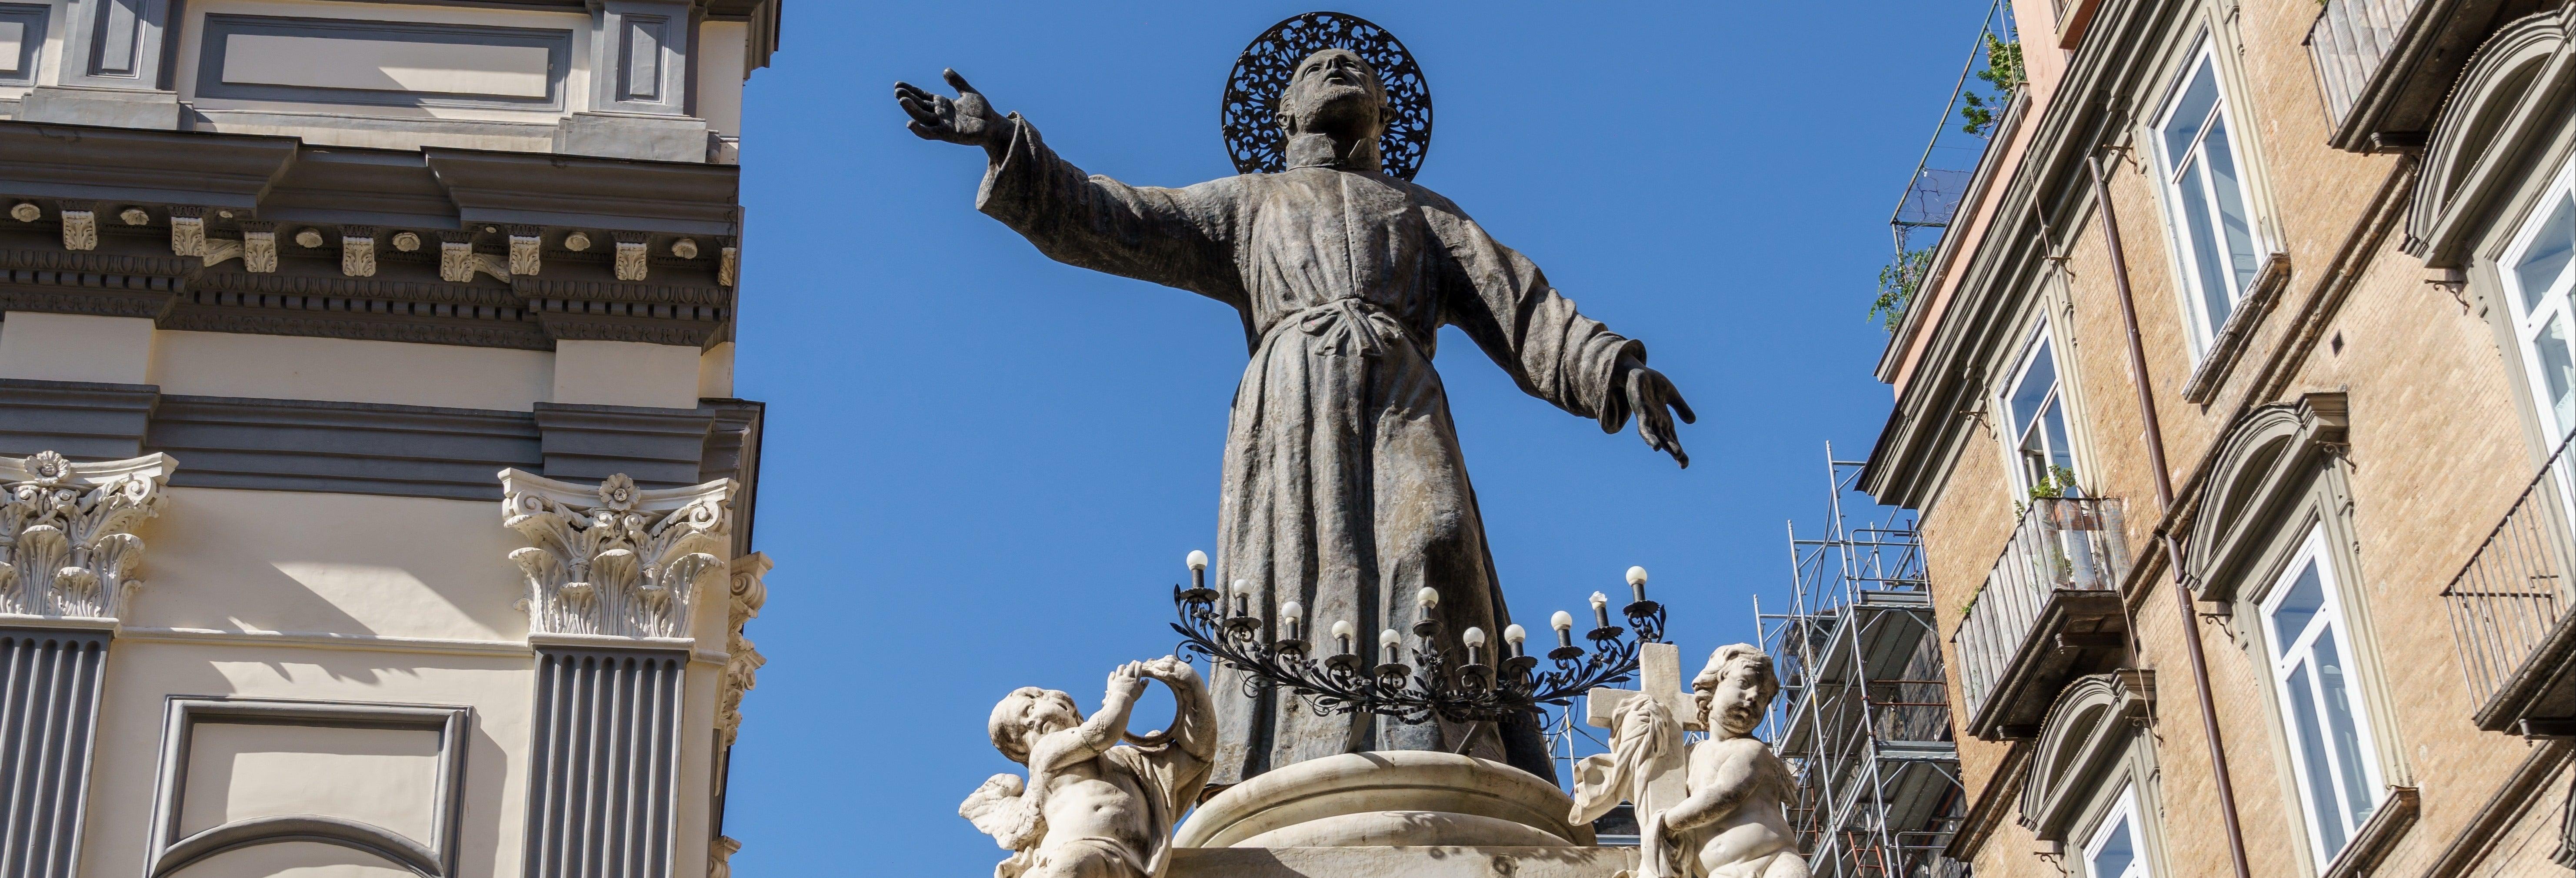 Free tour por el Nápoles antiguo